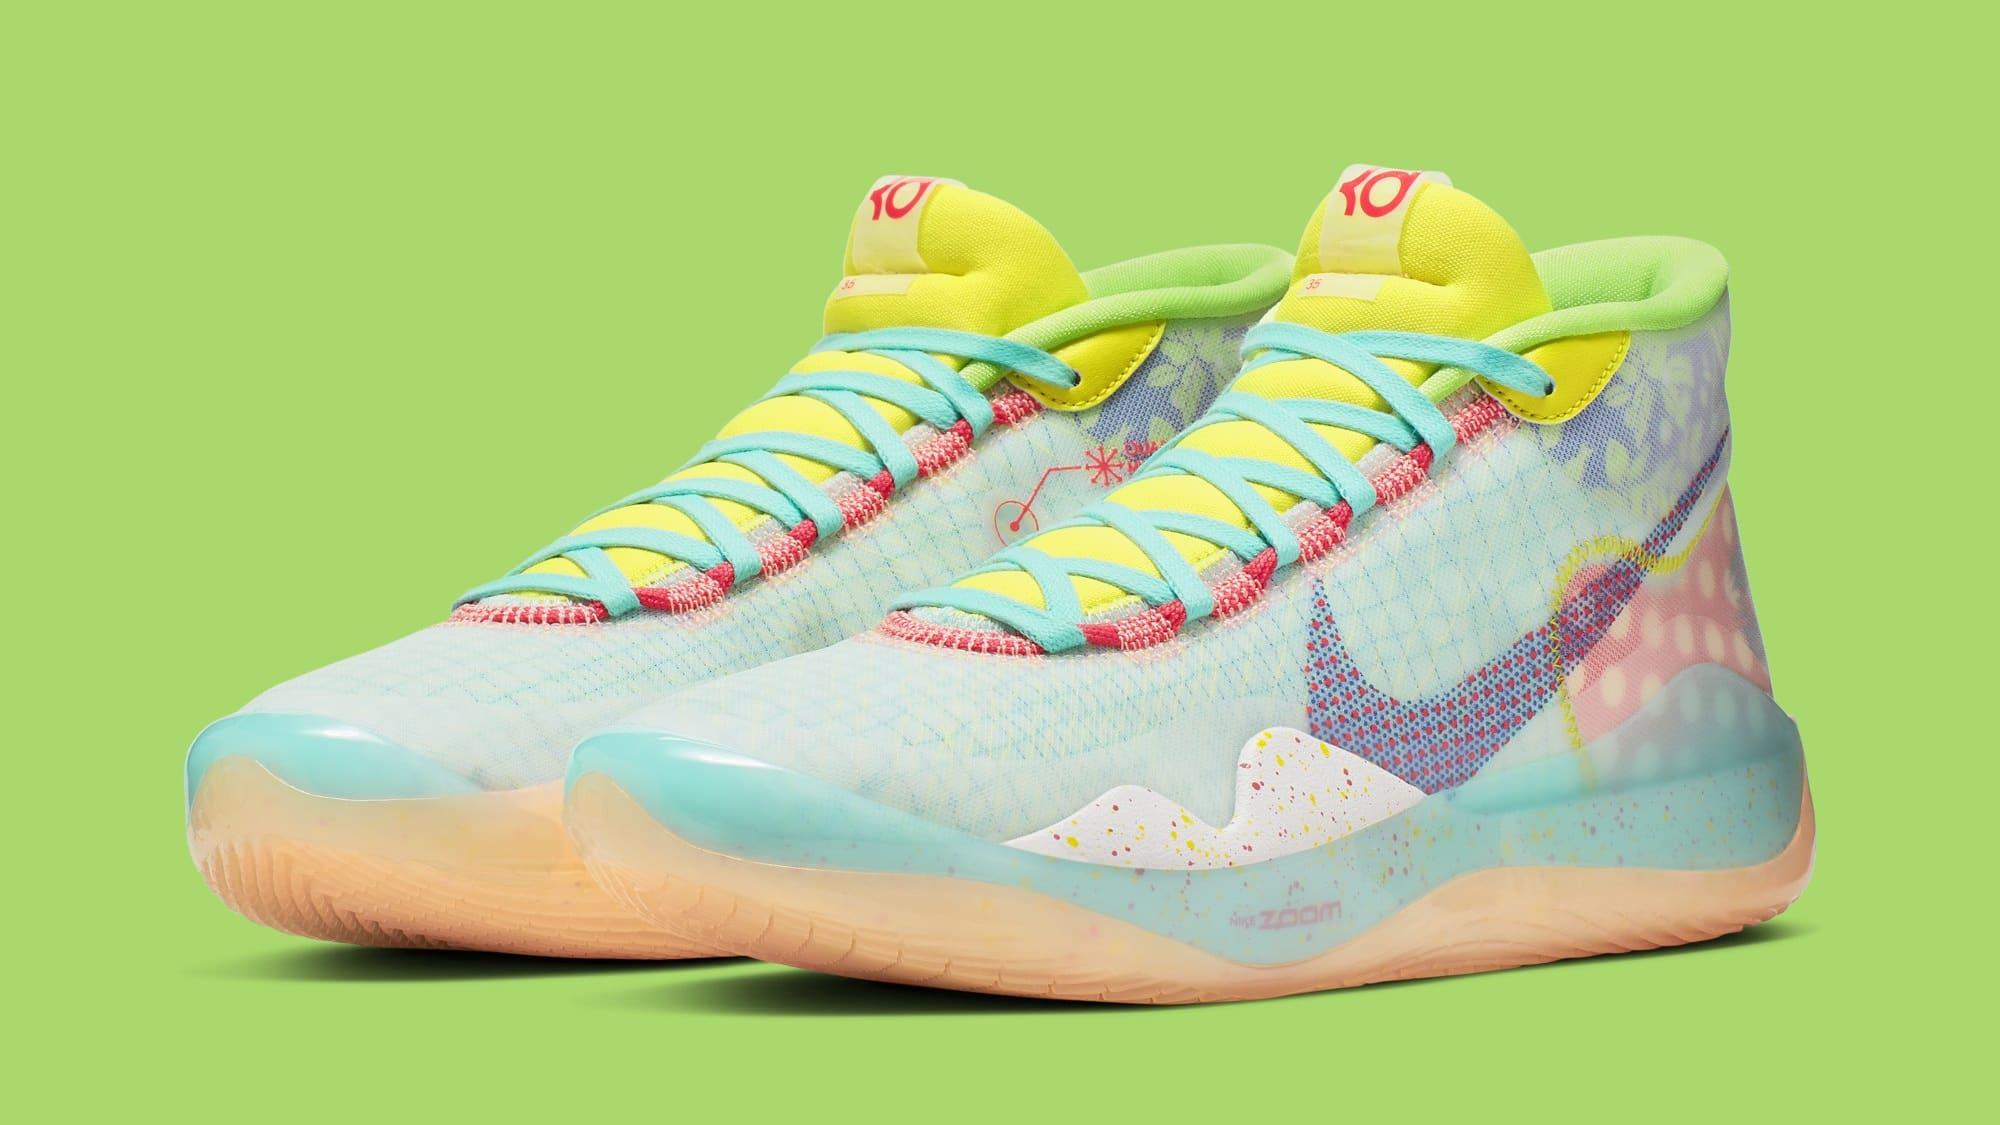 Nike KD 12 'EYBL' CK1195-300 (Pair)